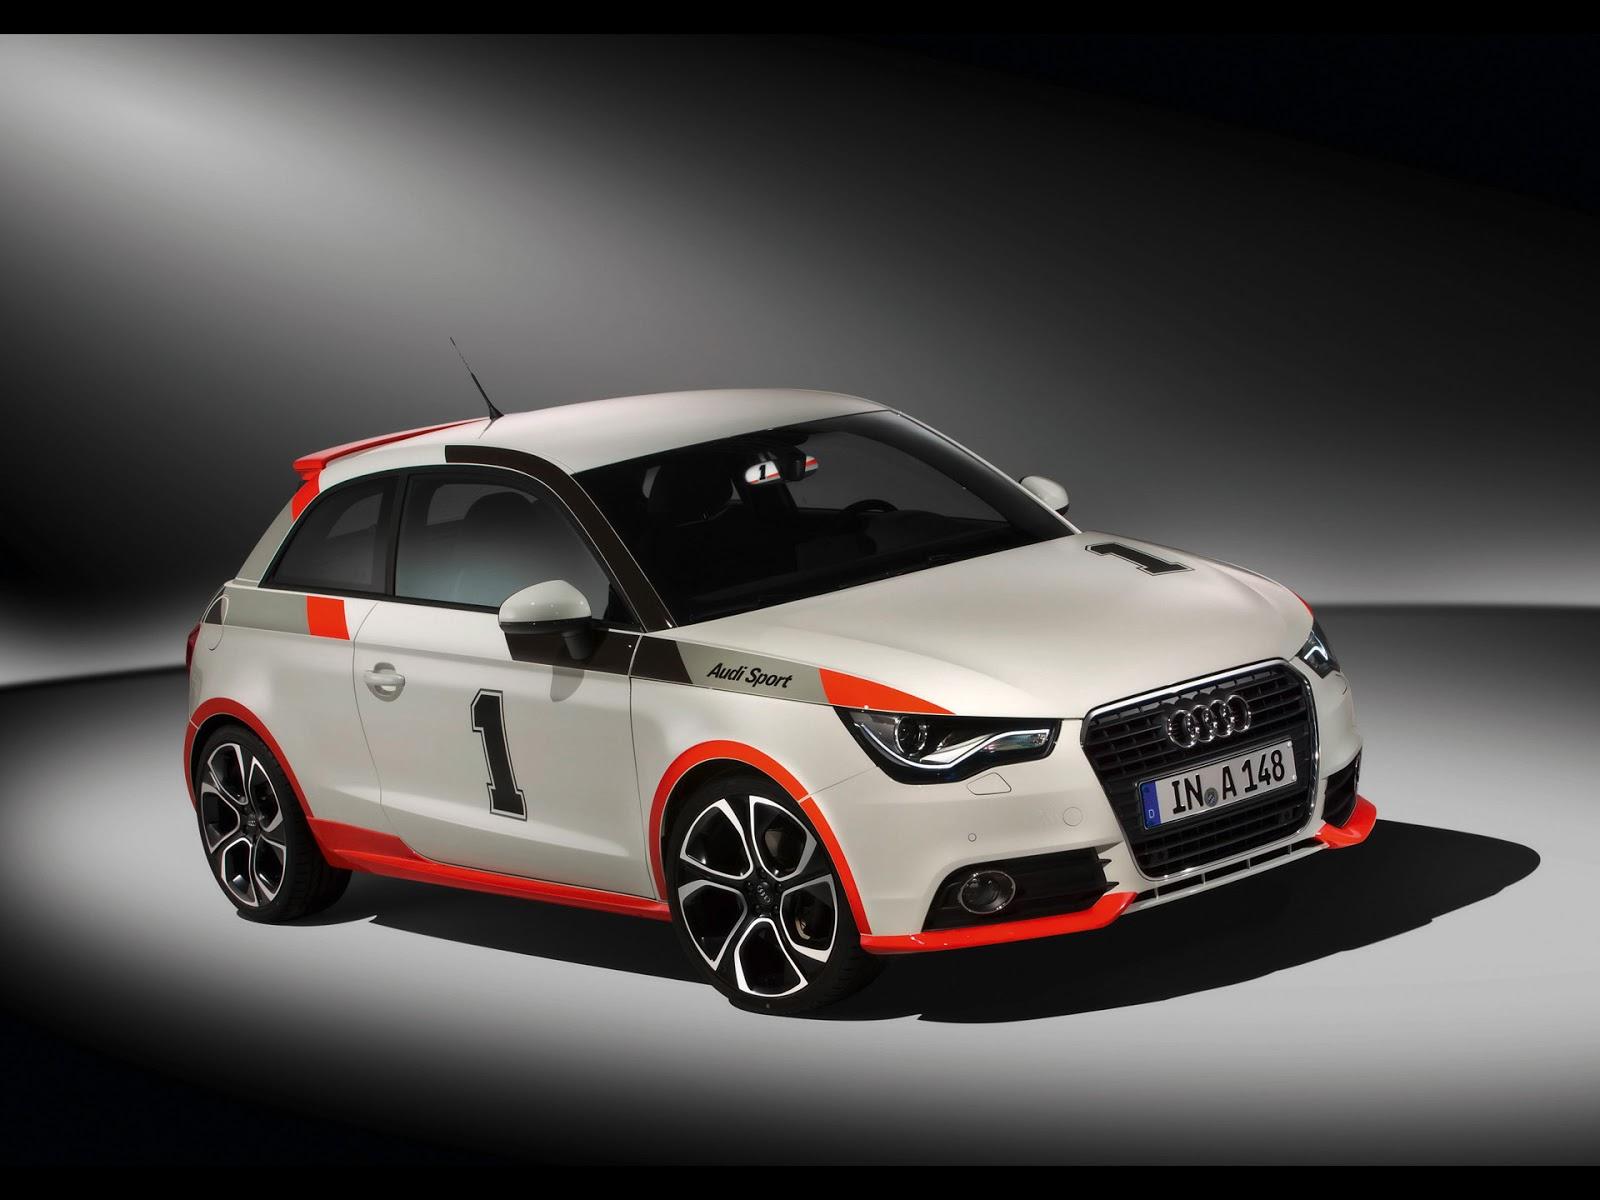 White Orange Audi A1 Race Tuning Wall Box